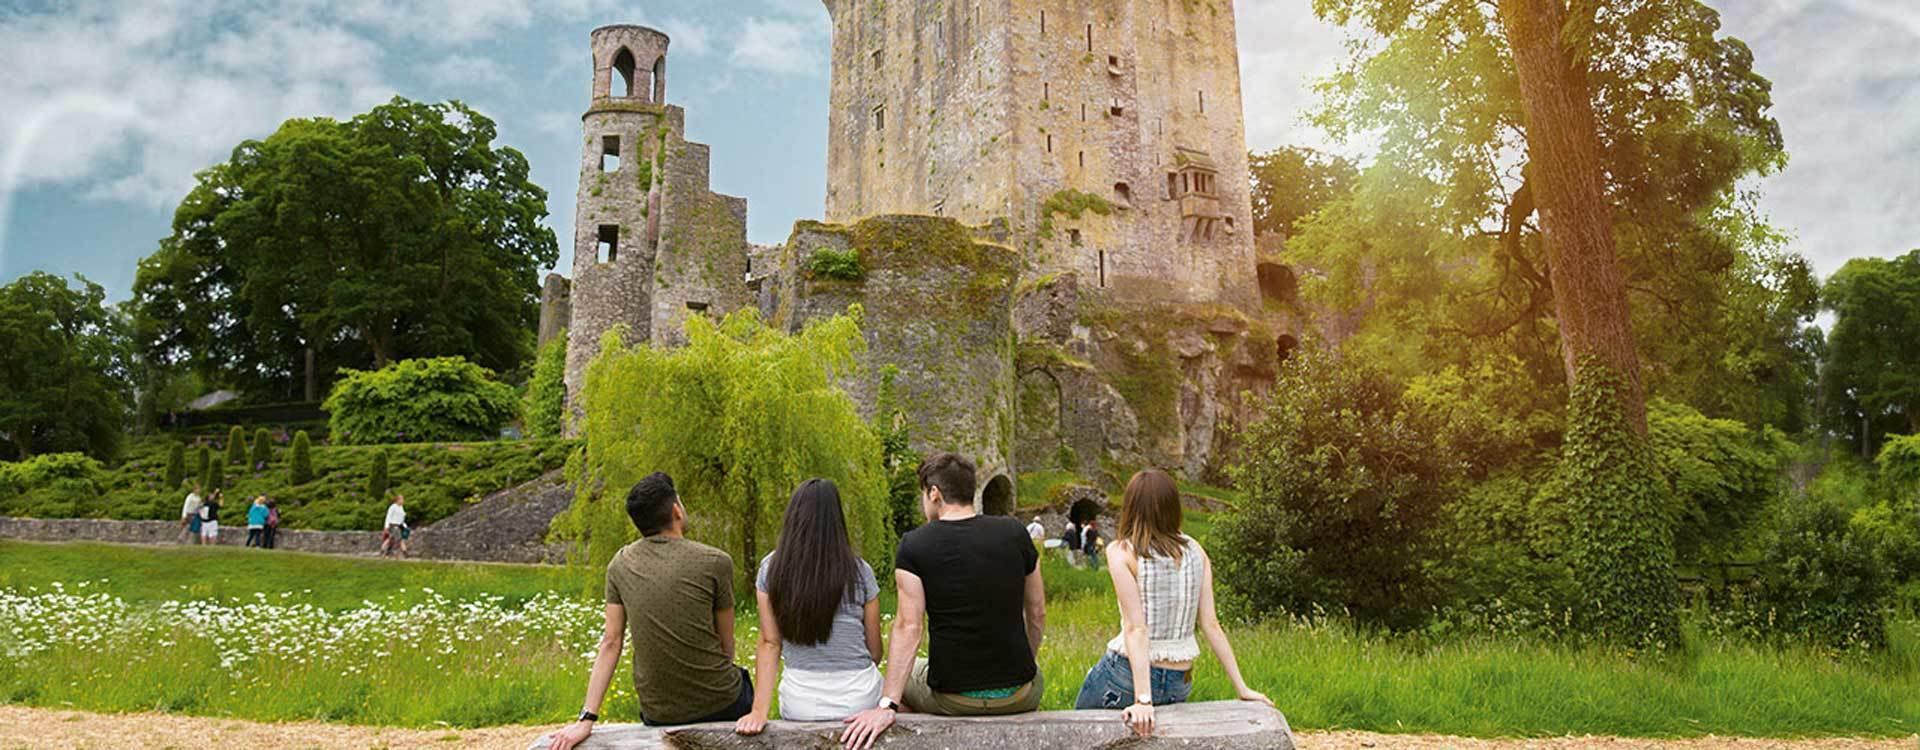 Blarney Castle Tour from Dublin